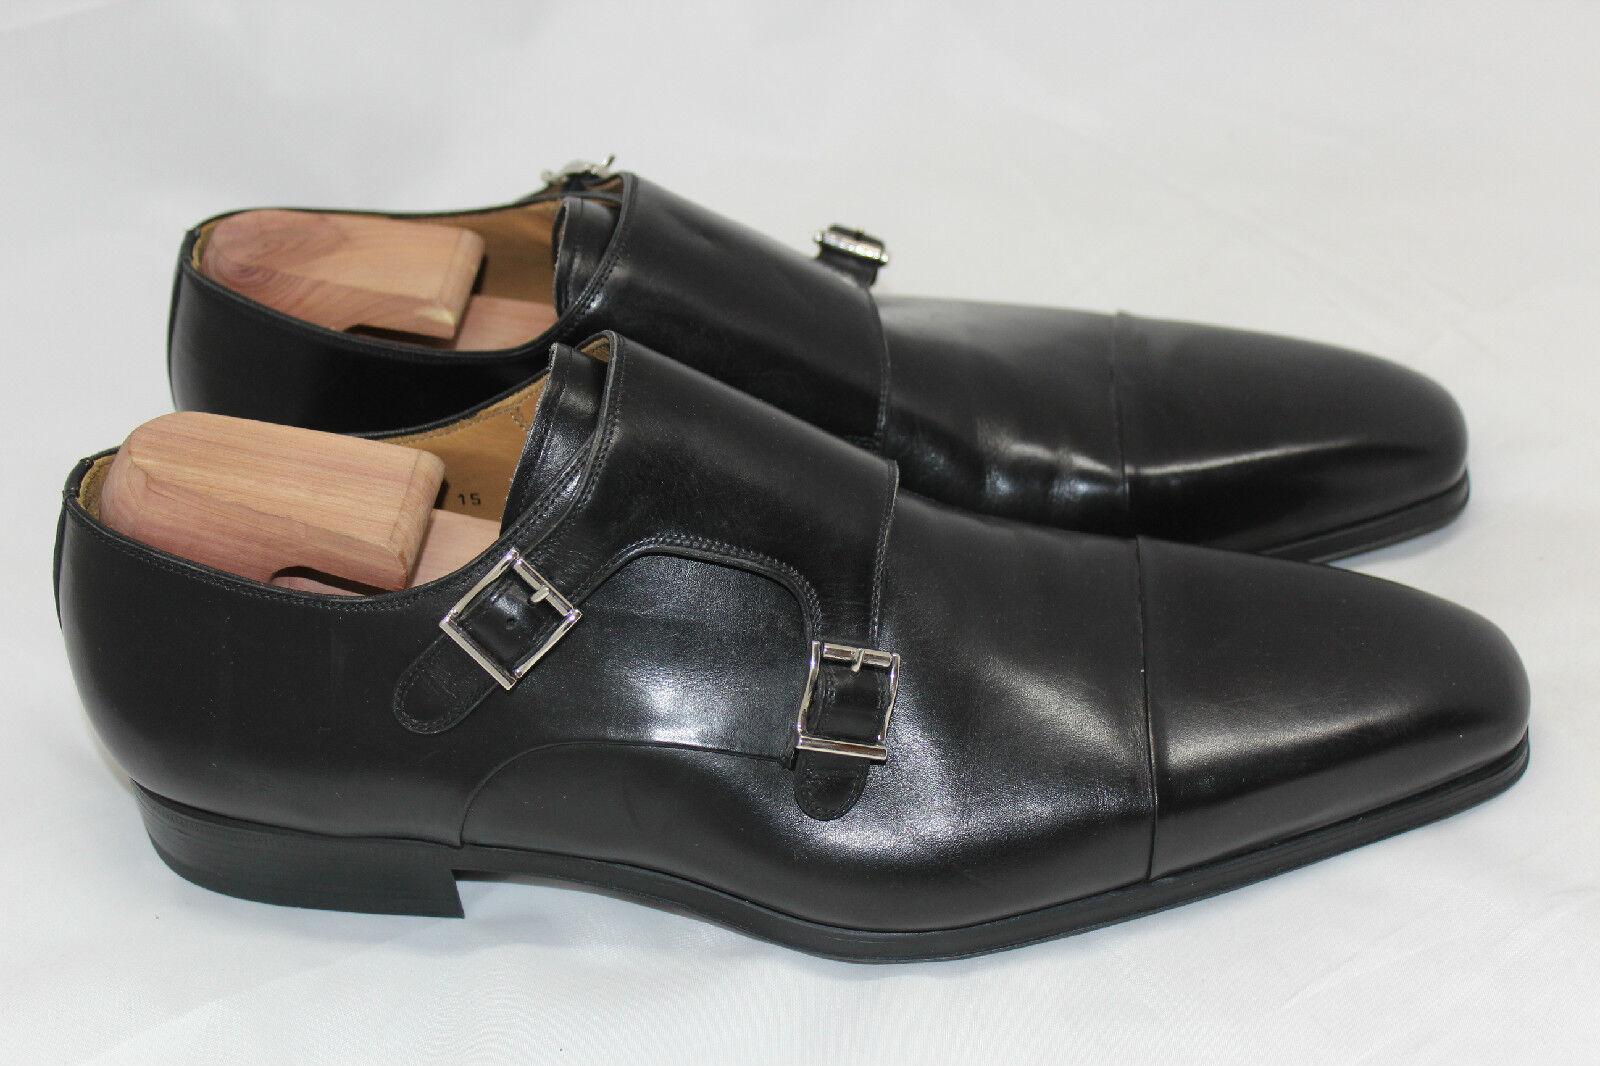 Magnanni'Gaumet 'Doppia  Strap Monk Dress scarpe Lofer Buckle nero 15 M (Q37)  vendita calda online